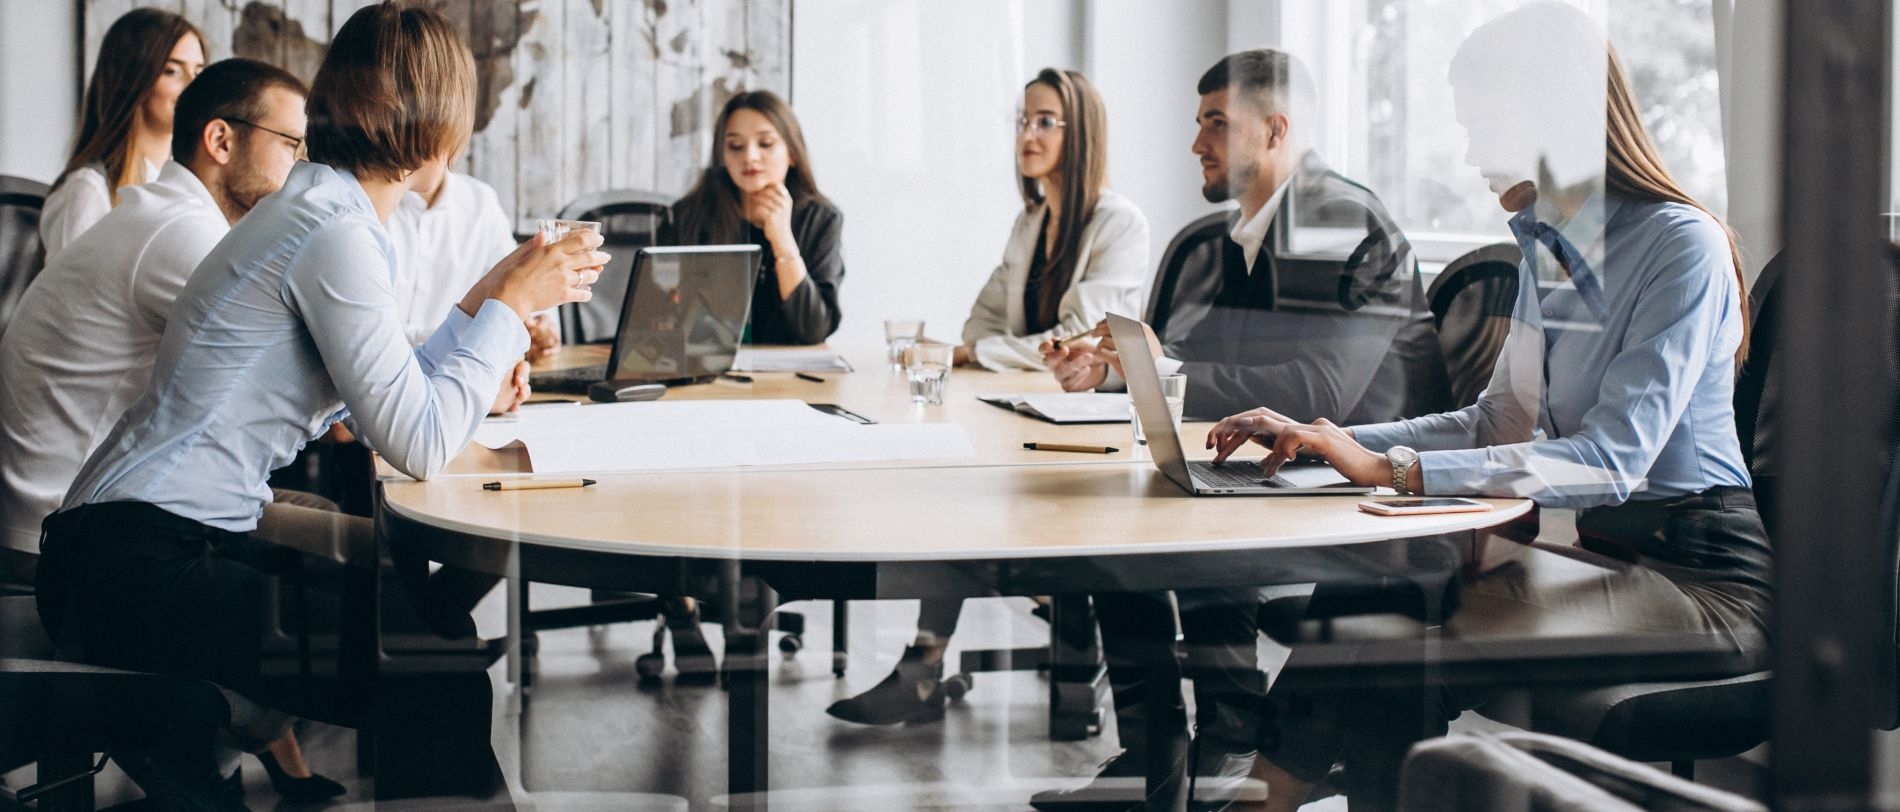 CSE  (1 - 49 salariés): Missions et Attributions